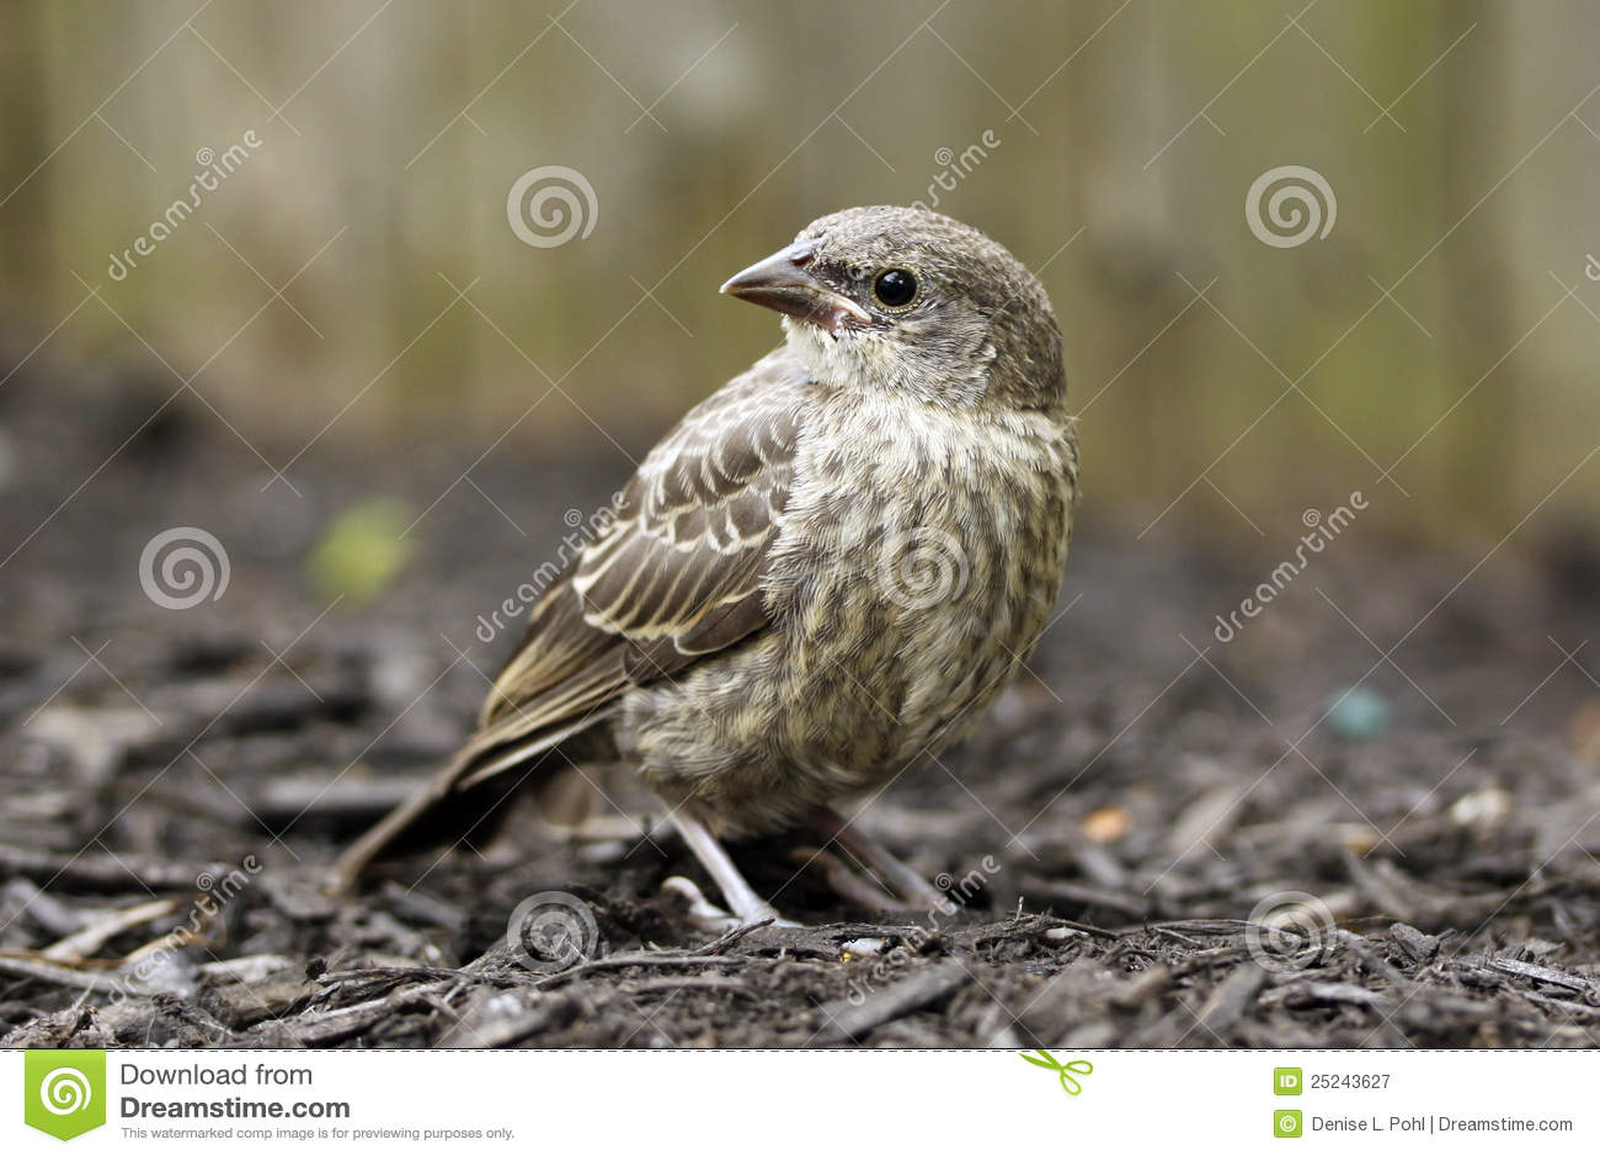 Baby House Finch Bird ...